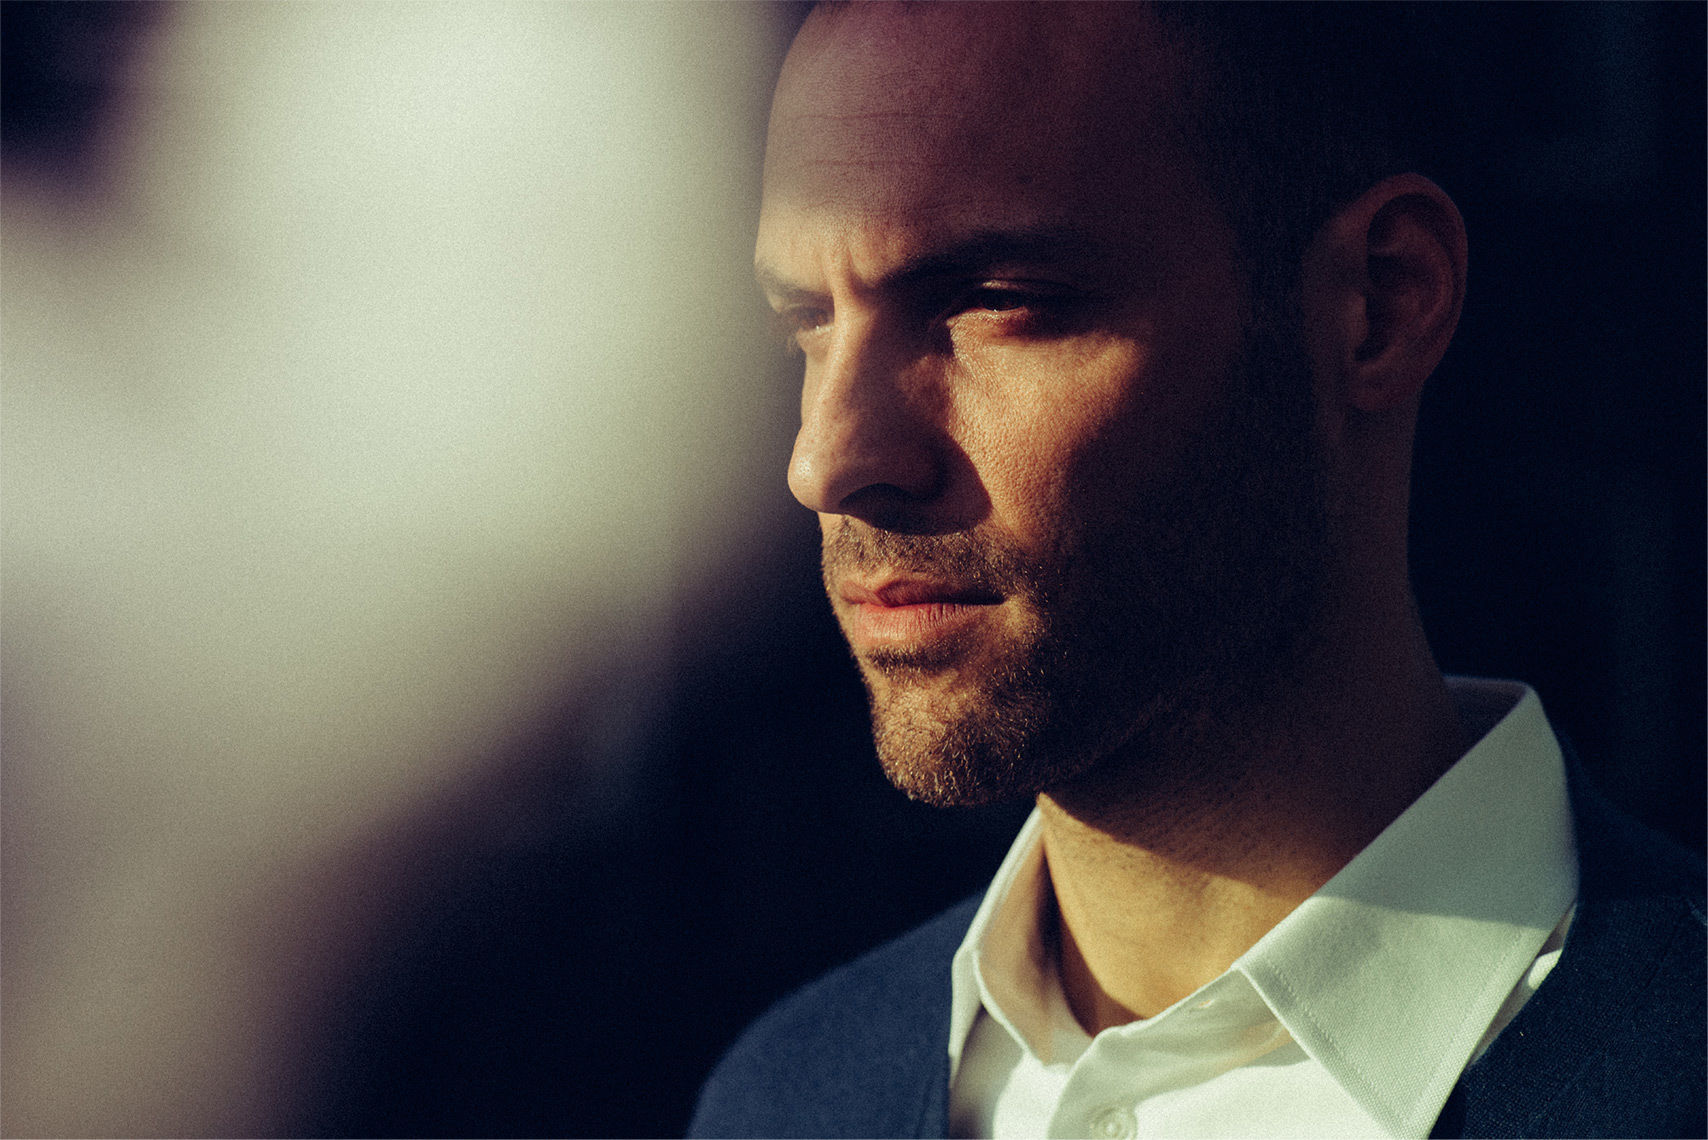 UPFRONT PHOTO & FILM: Murat Aslan